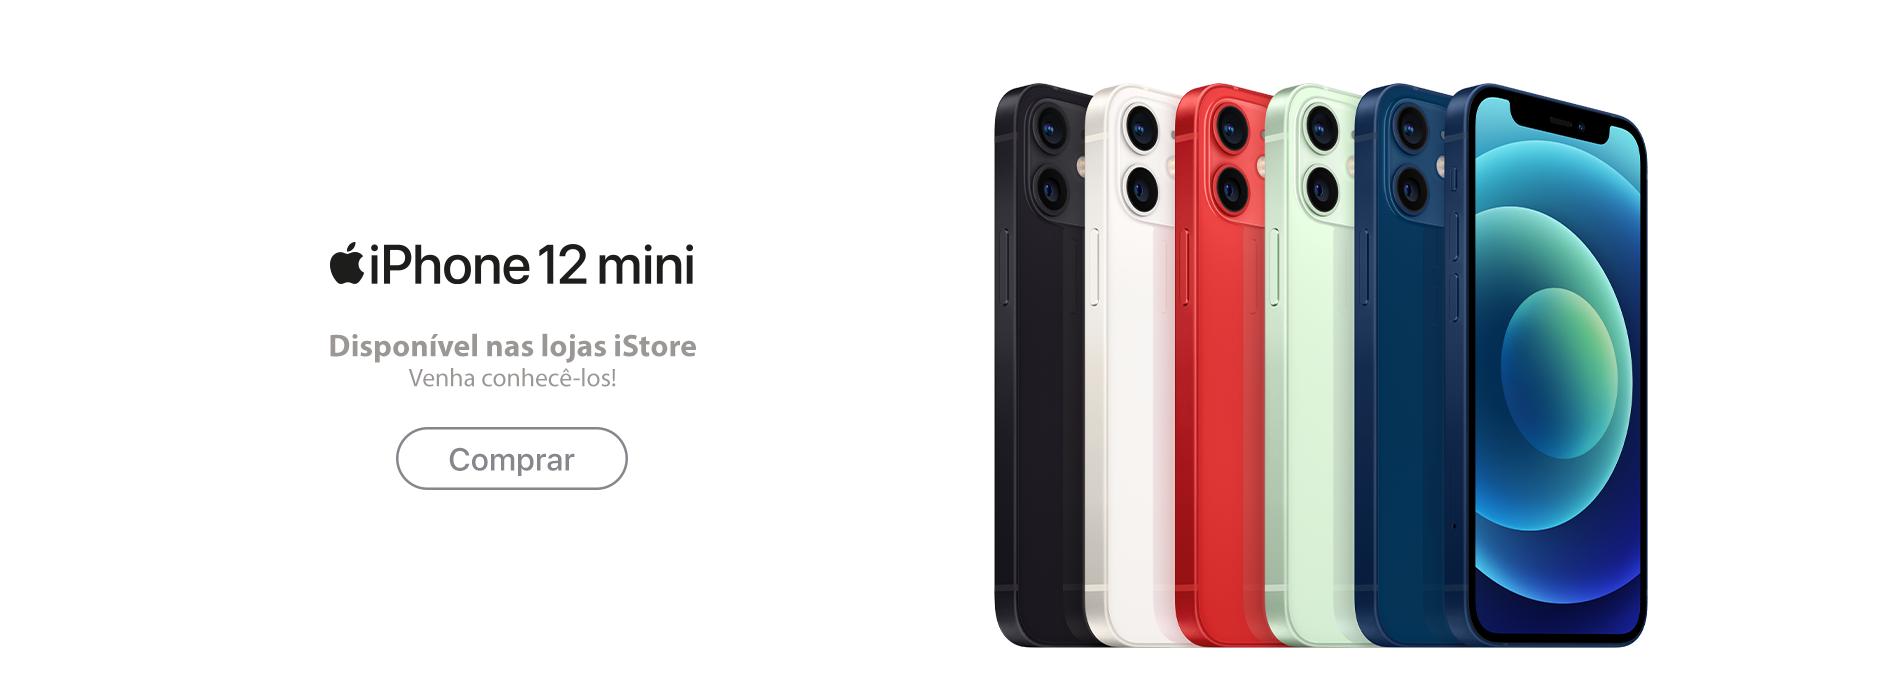 Homepage Slideshow - iPhone 12 Mini - Comprar